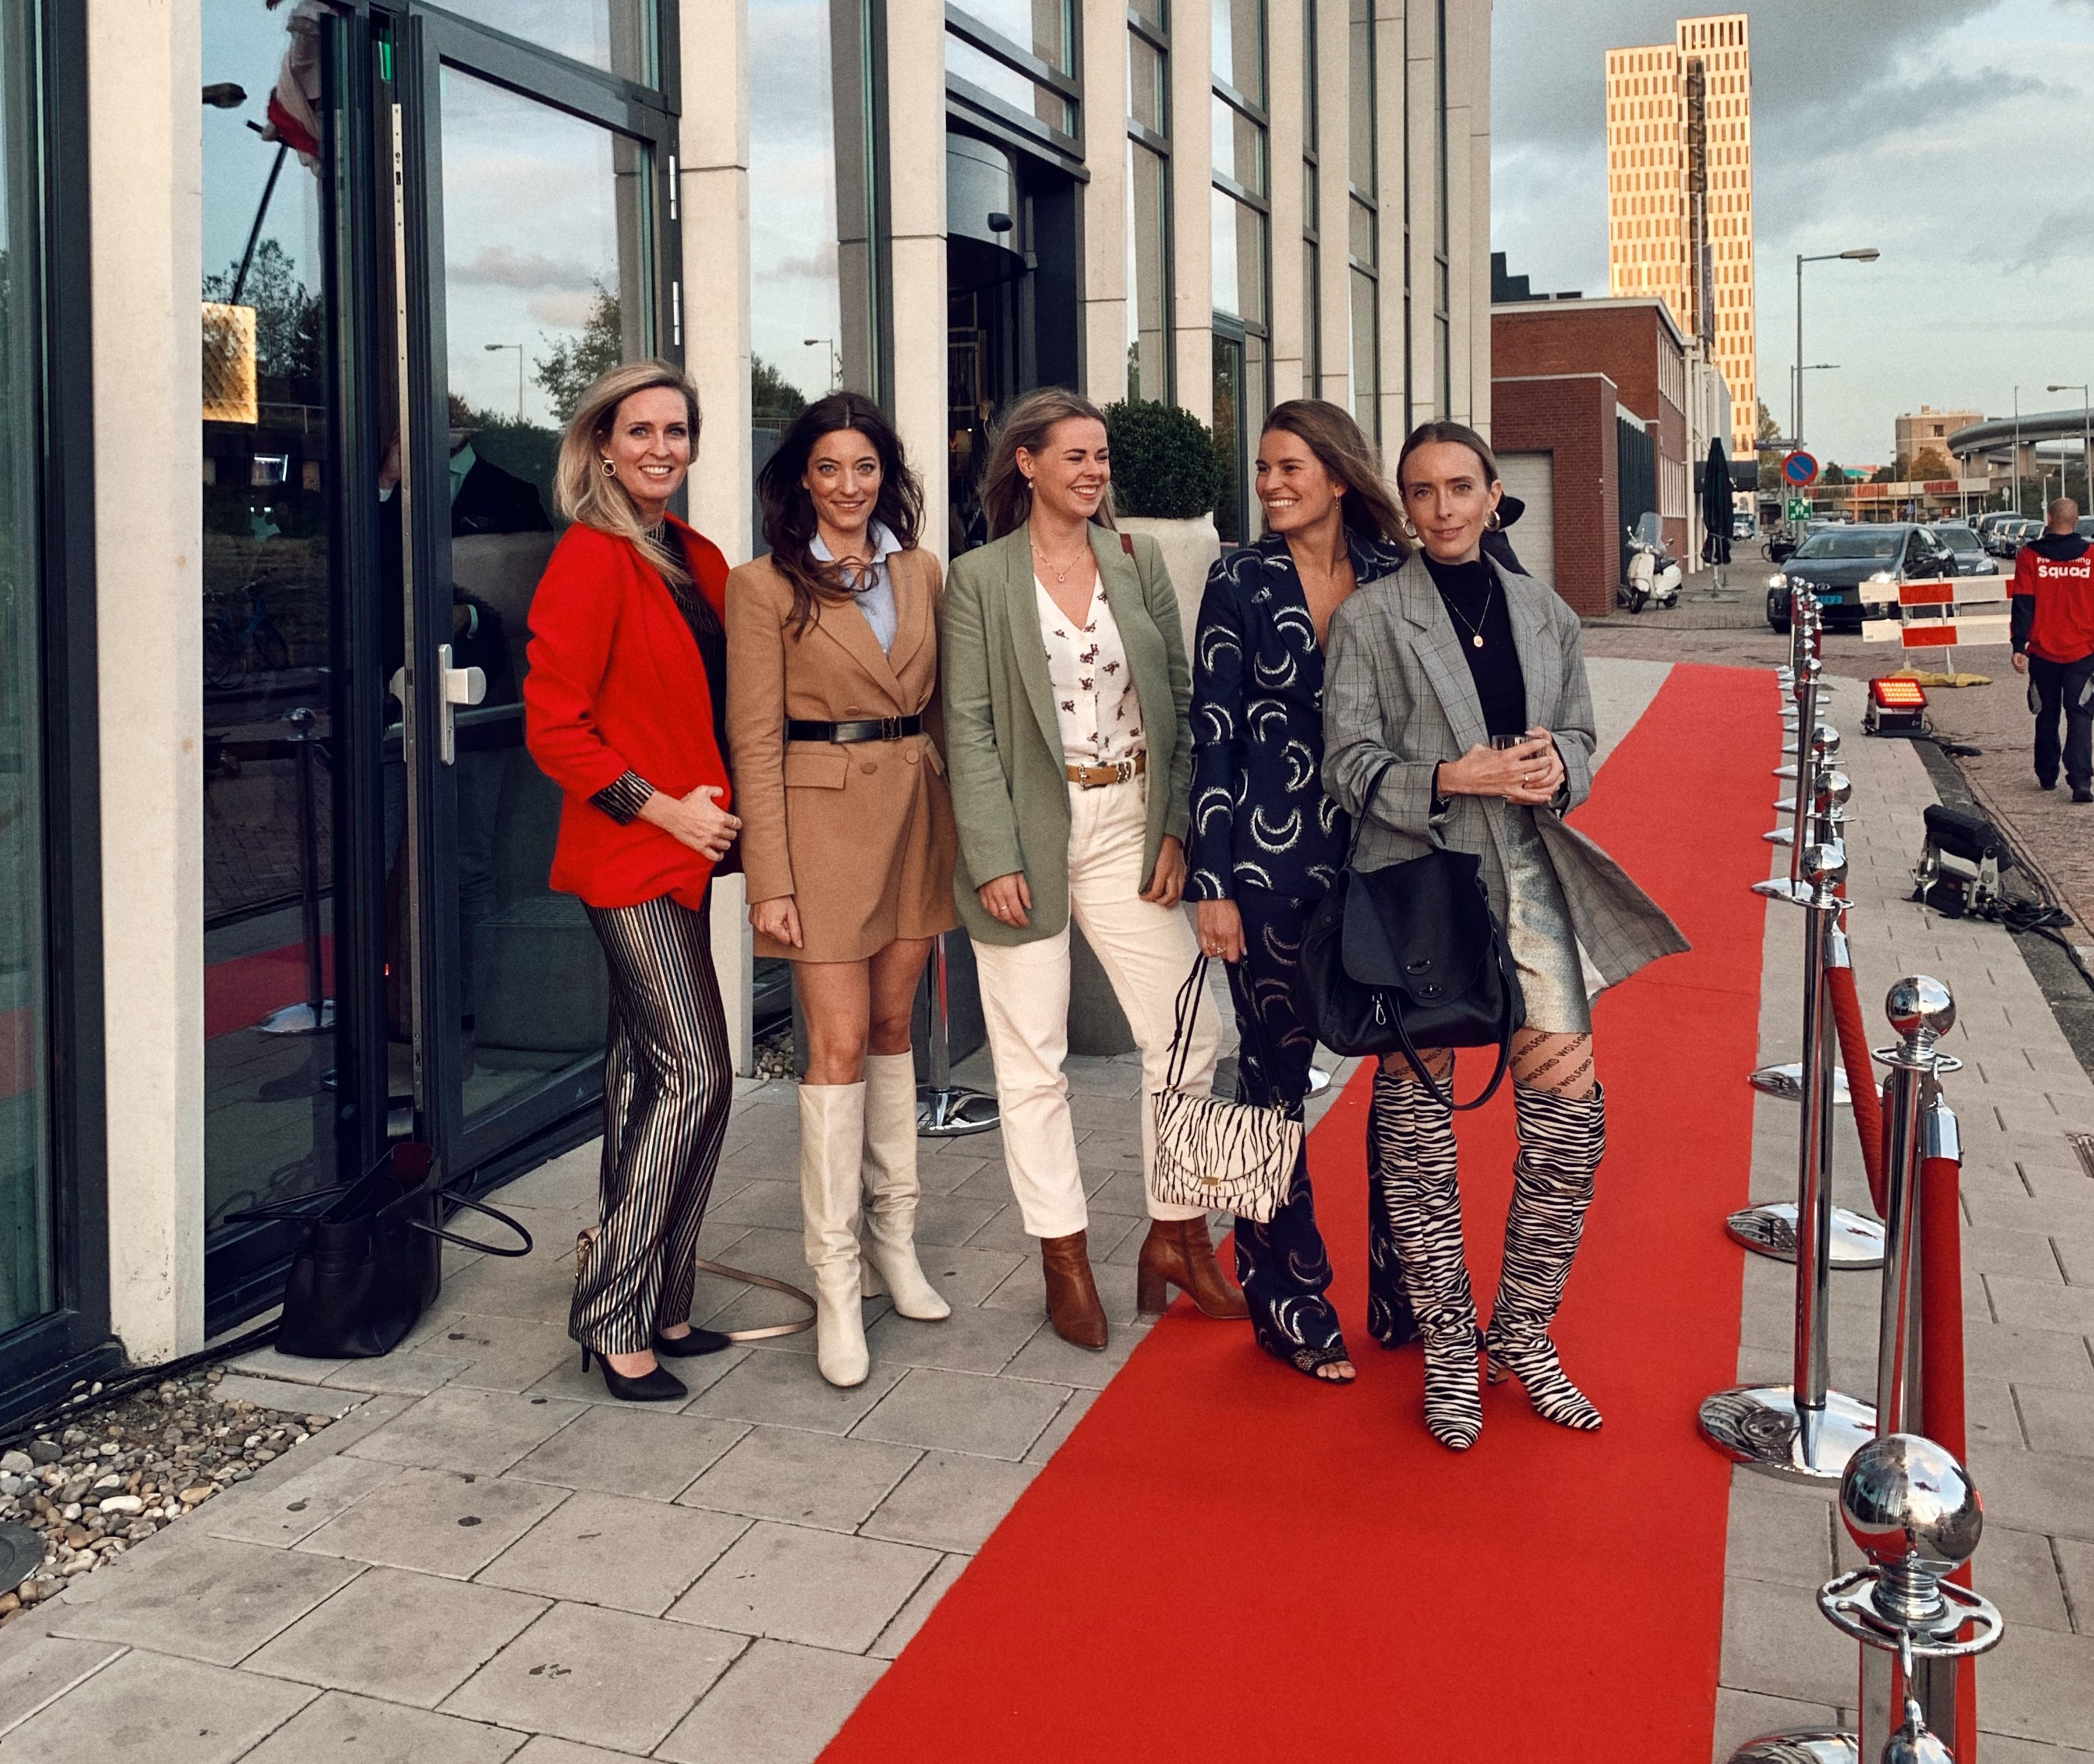 leonardo royal hotel amsterdam - powered by women - emilie sobels -wendy bogers - kiki bosman - florine duif - ambassadeurs hotel